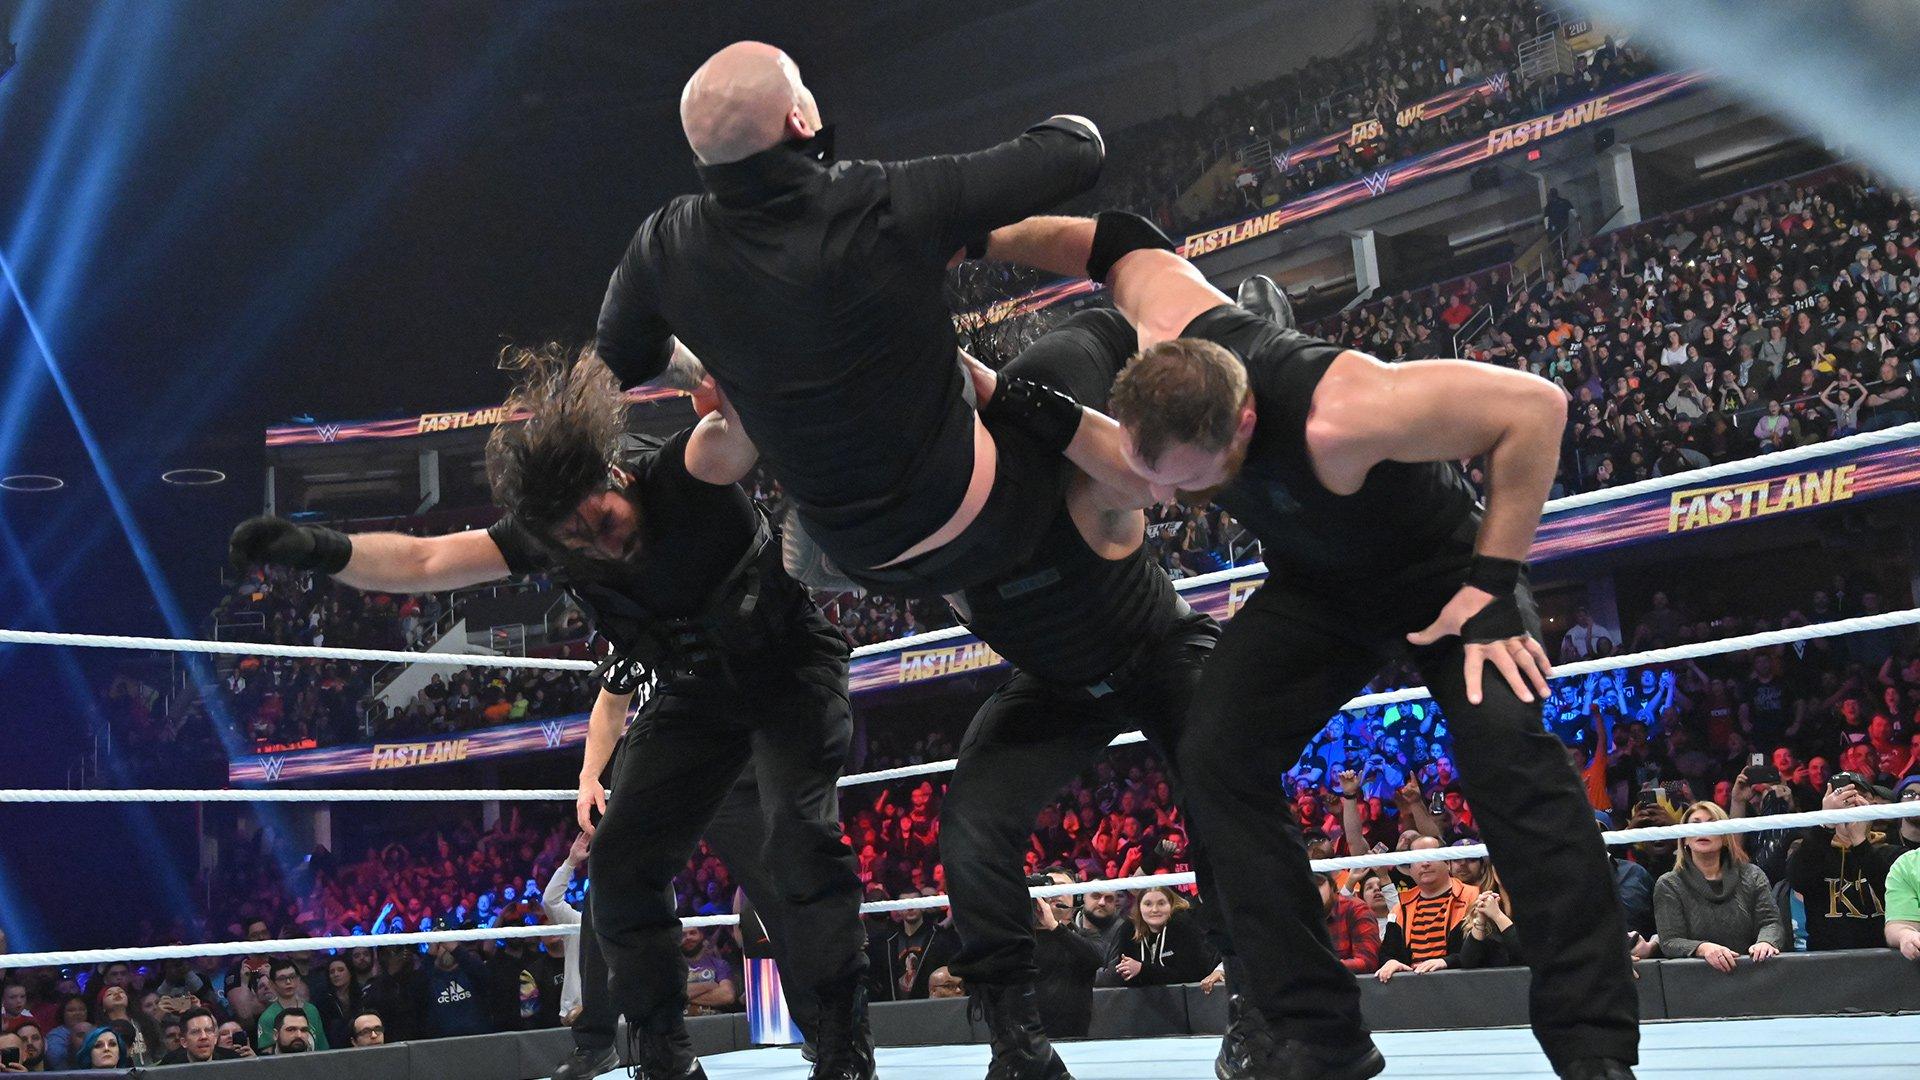 WWE Fastlane 2019 | WWE